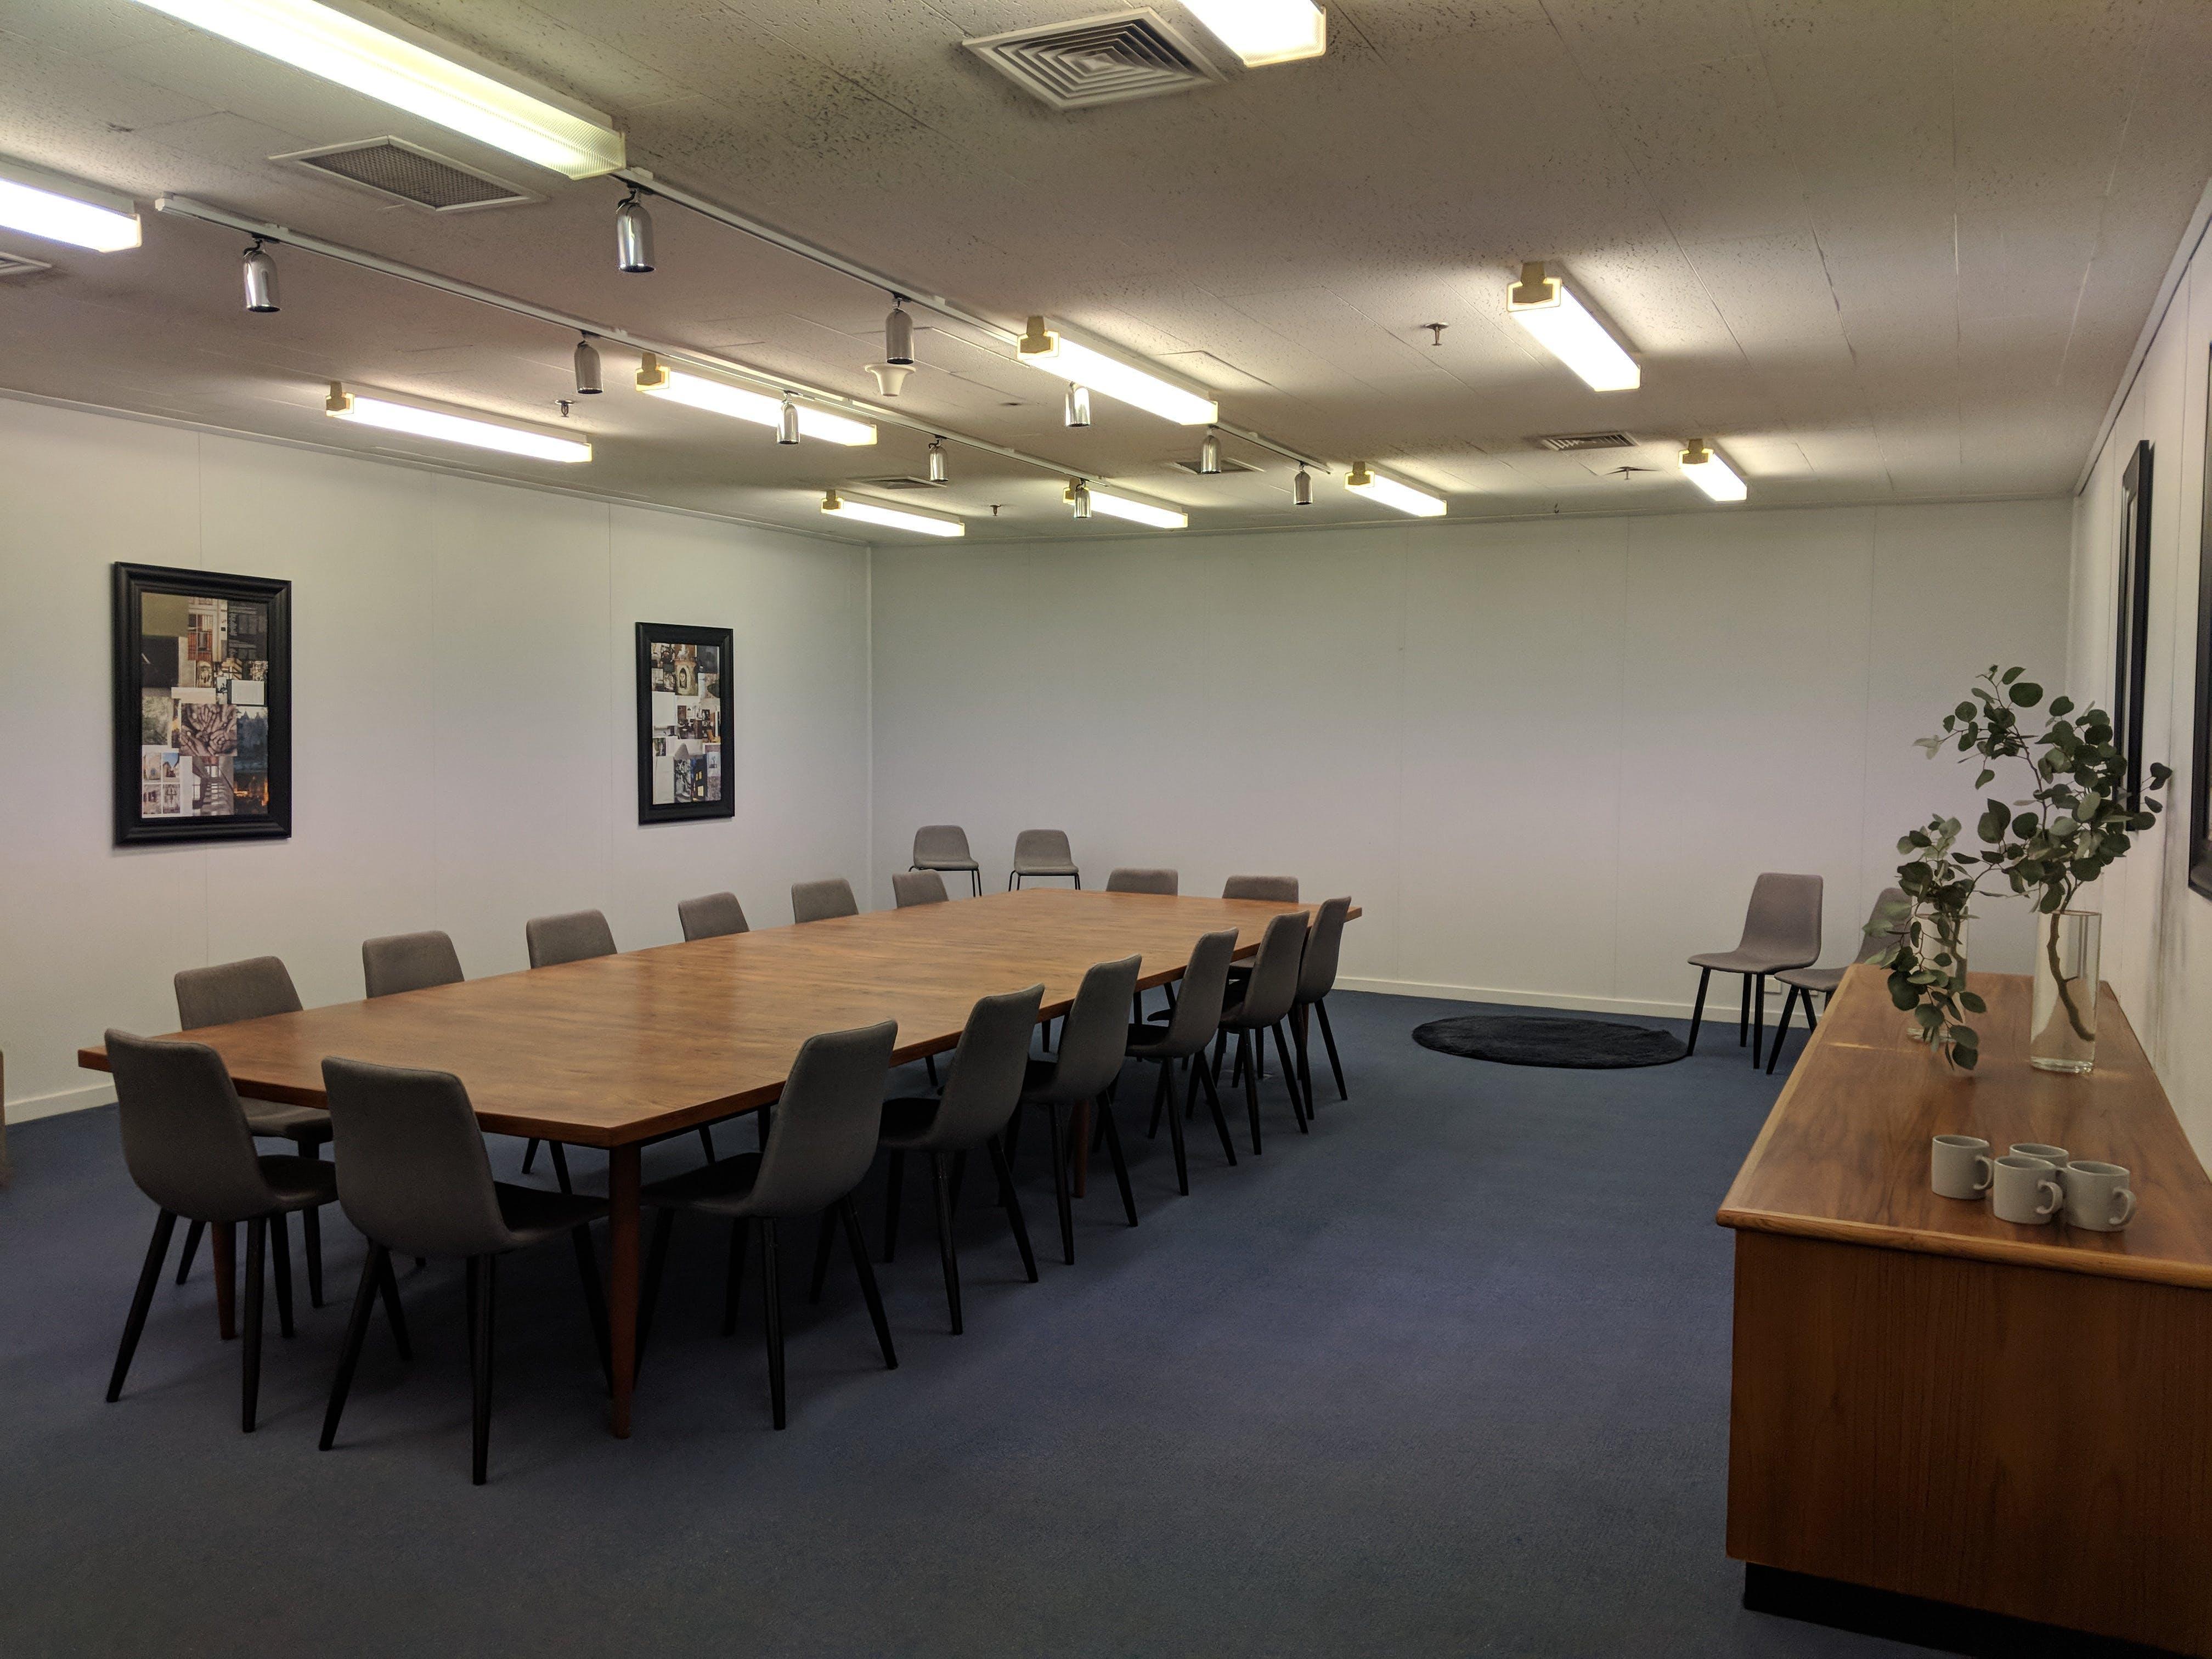 MG Board Room, training room at 140 Dawson, image 1